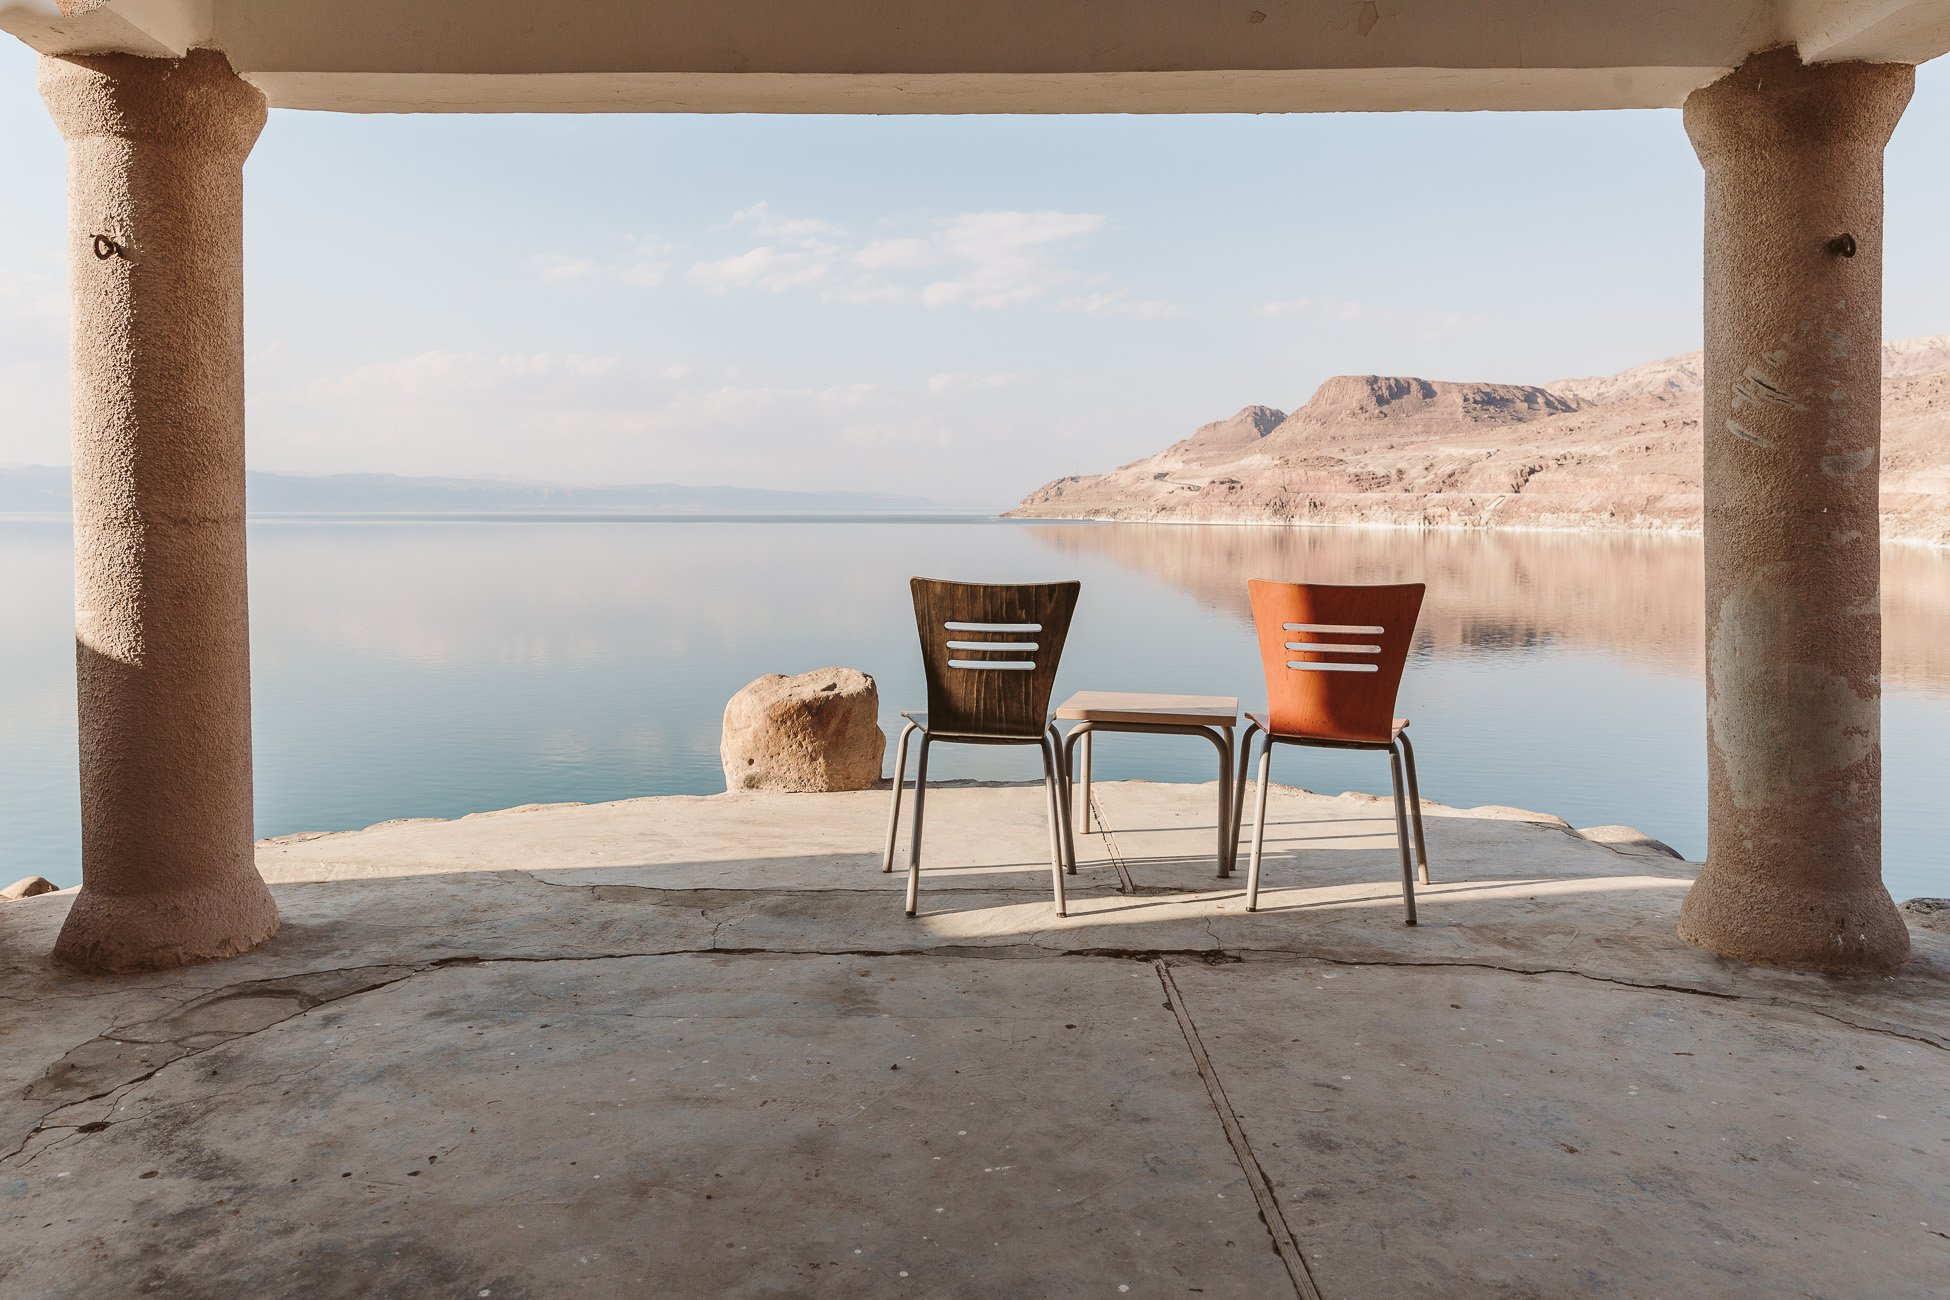 Mujib Chalets Jordan Dead Sea